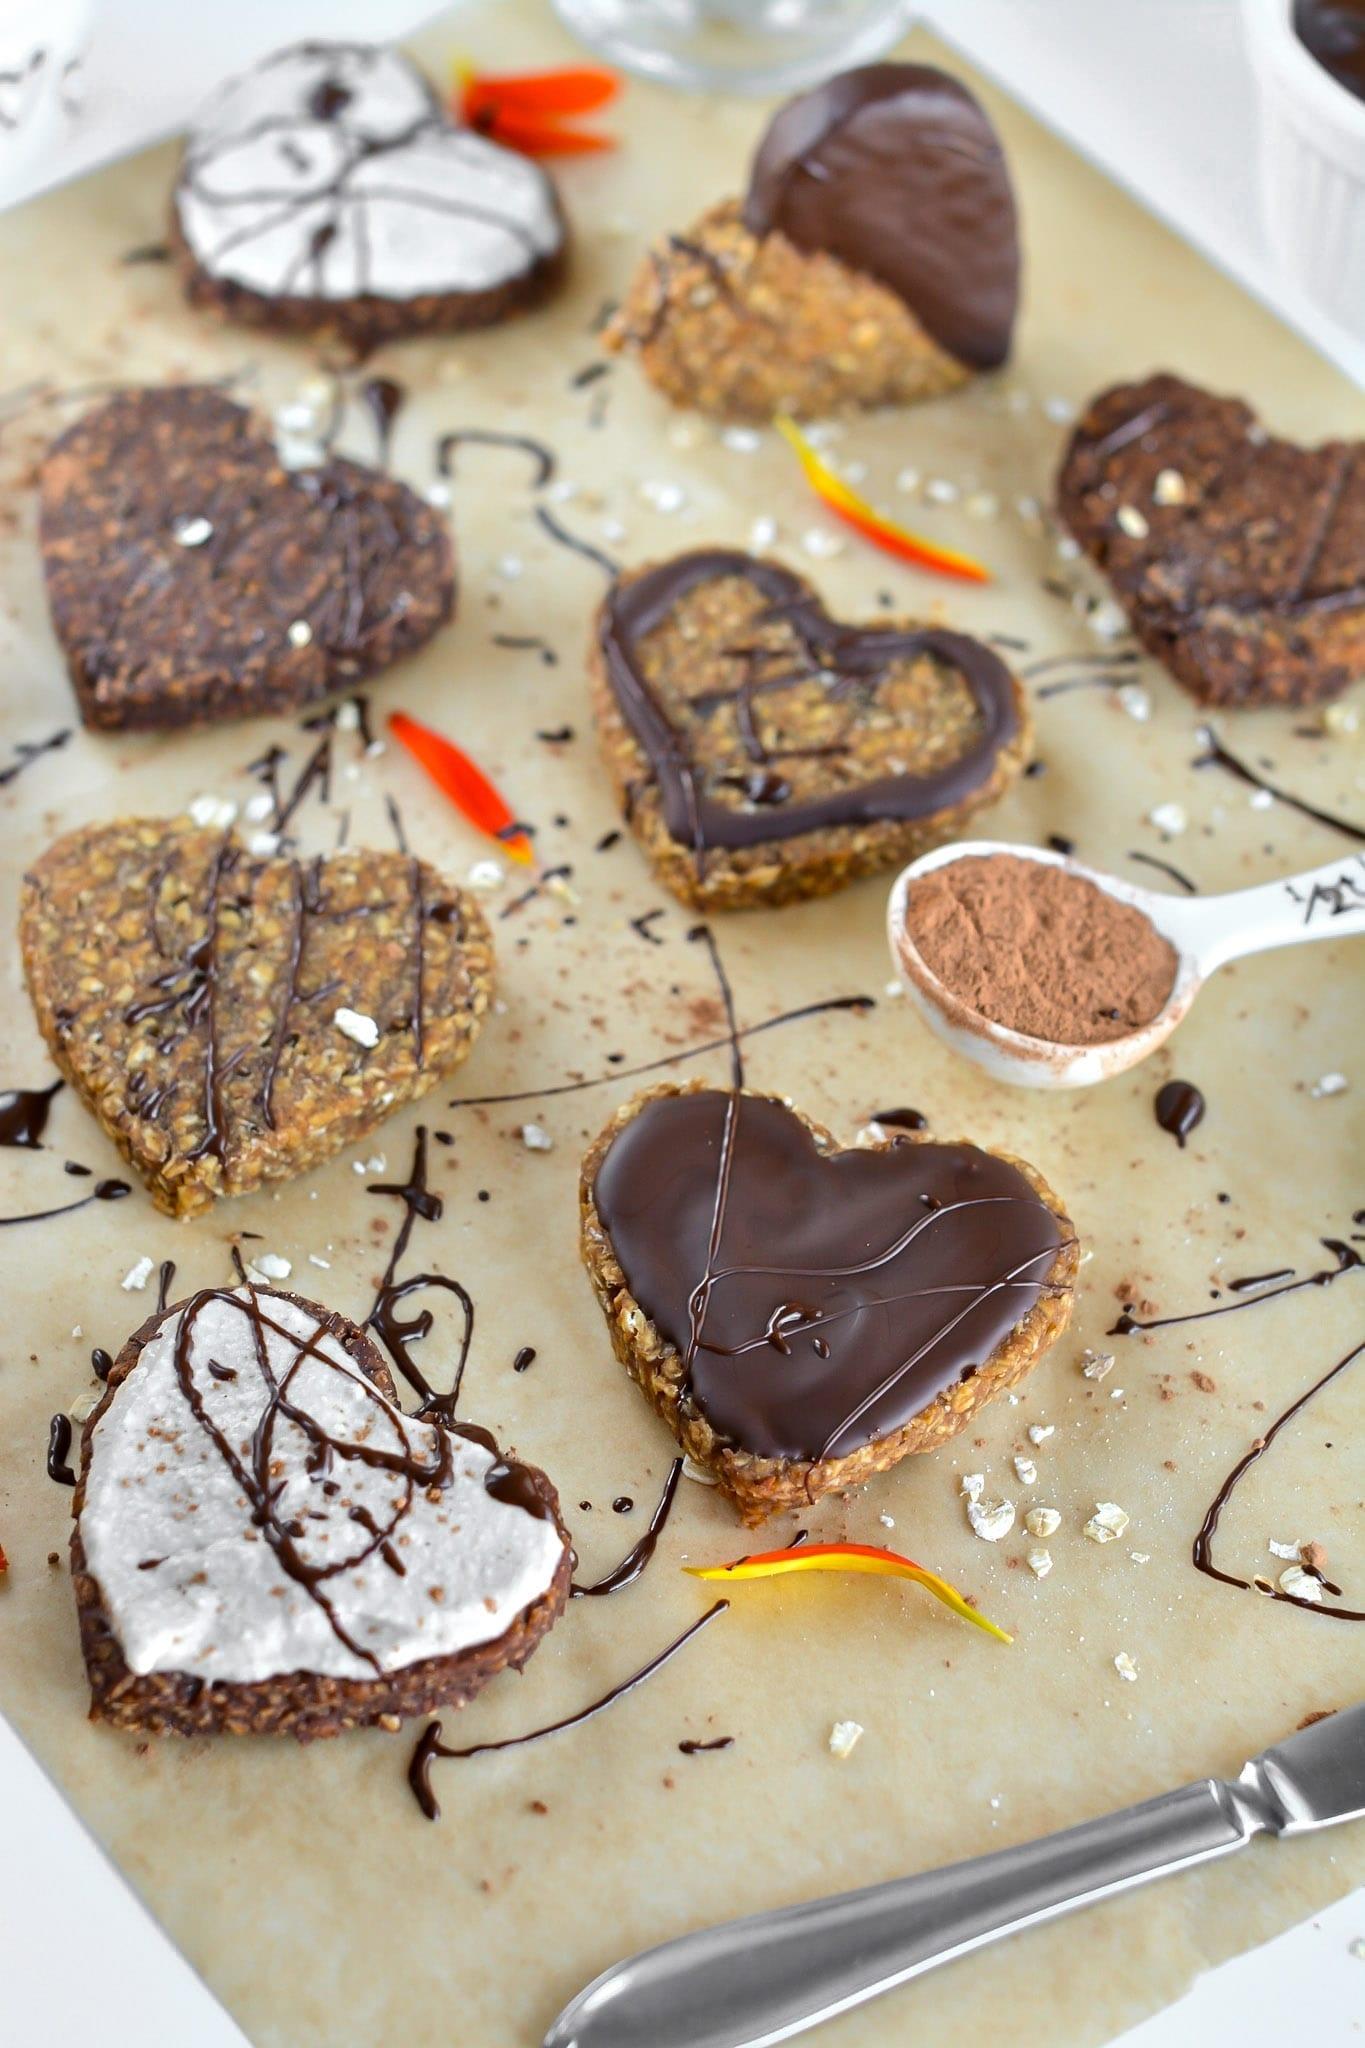 Cookies, Oat-Banana-Chocolate